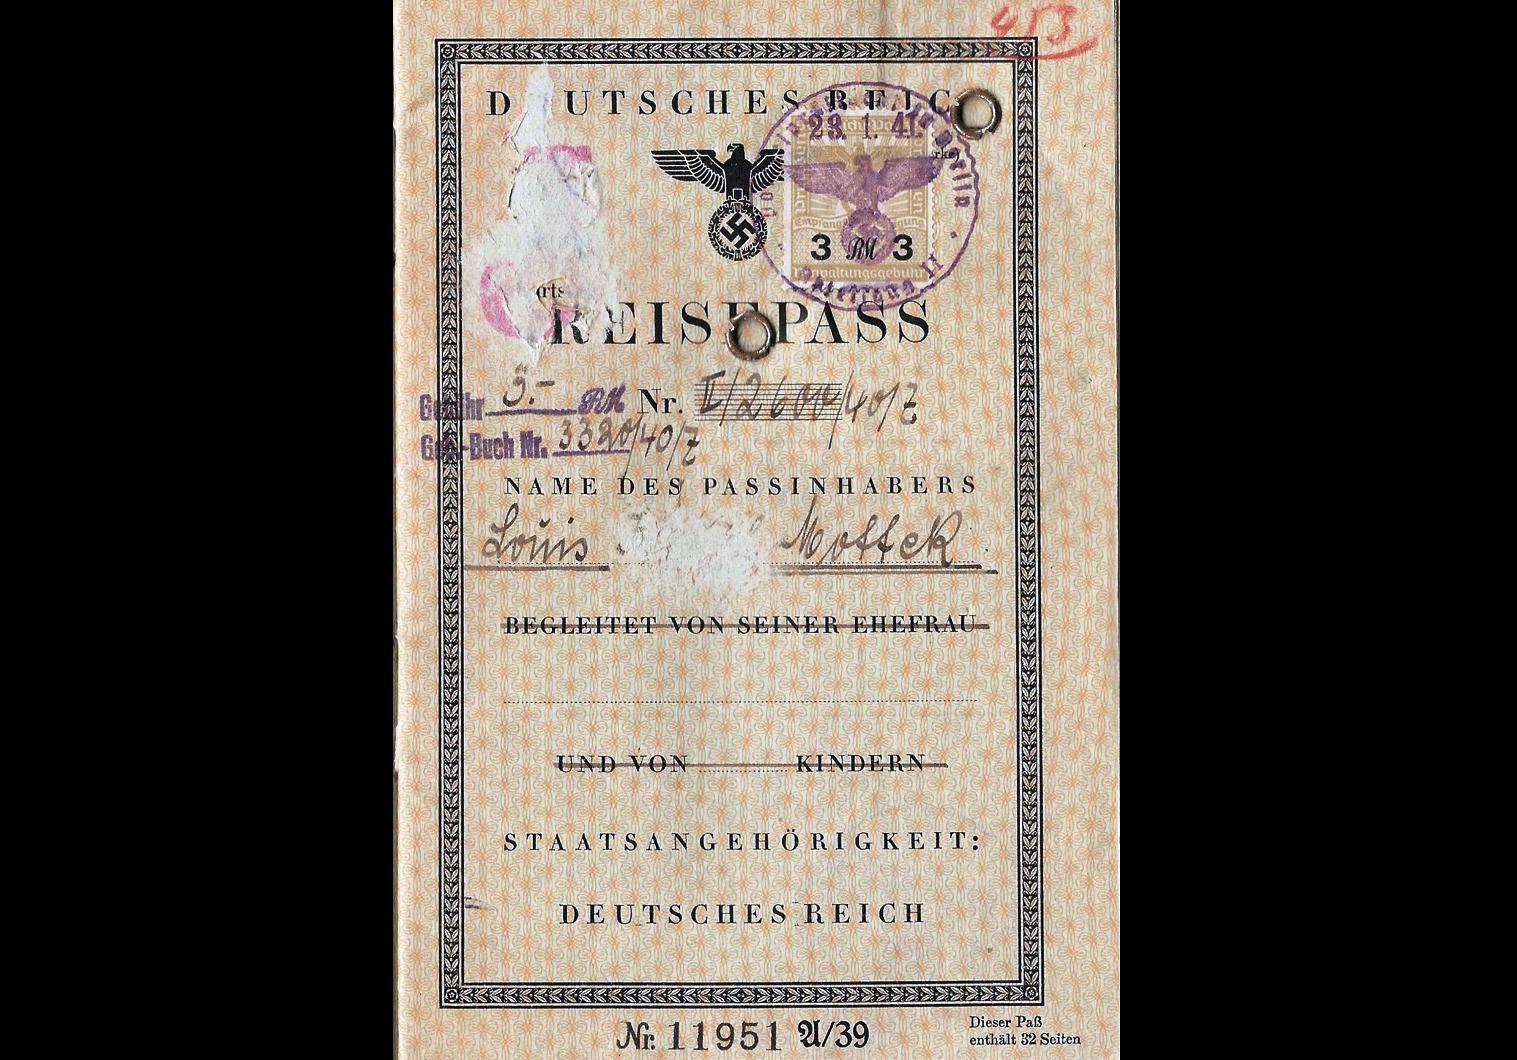 J stamped German passport from 1941